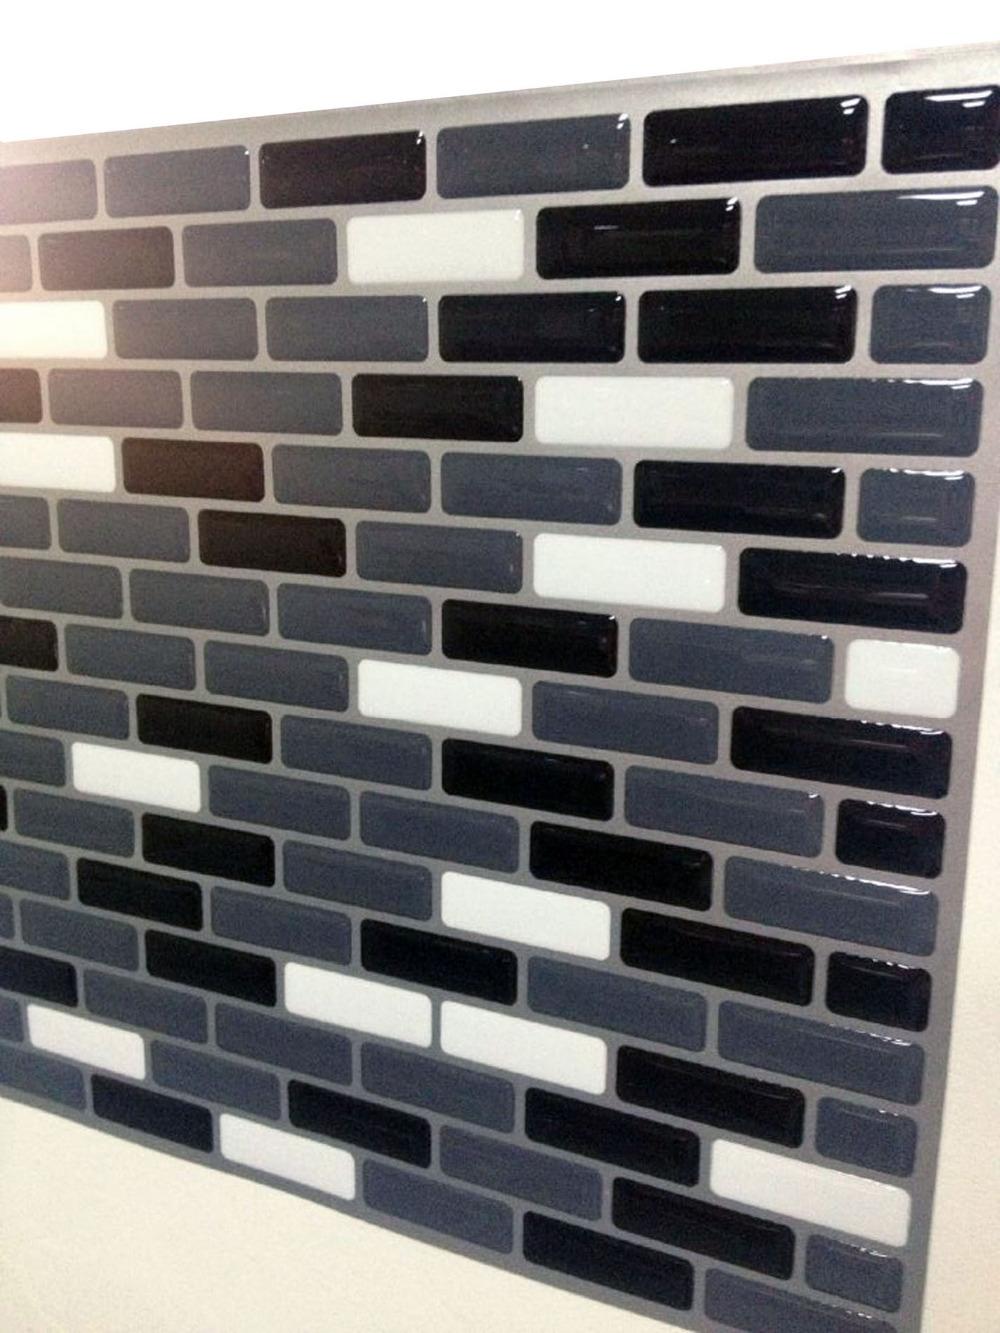 High Quality Anti-mold Peel and Stick Tile (6) pvc bathroom floor tiles(China (Mainland))